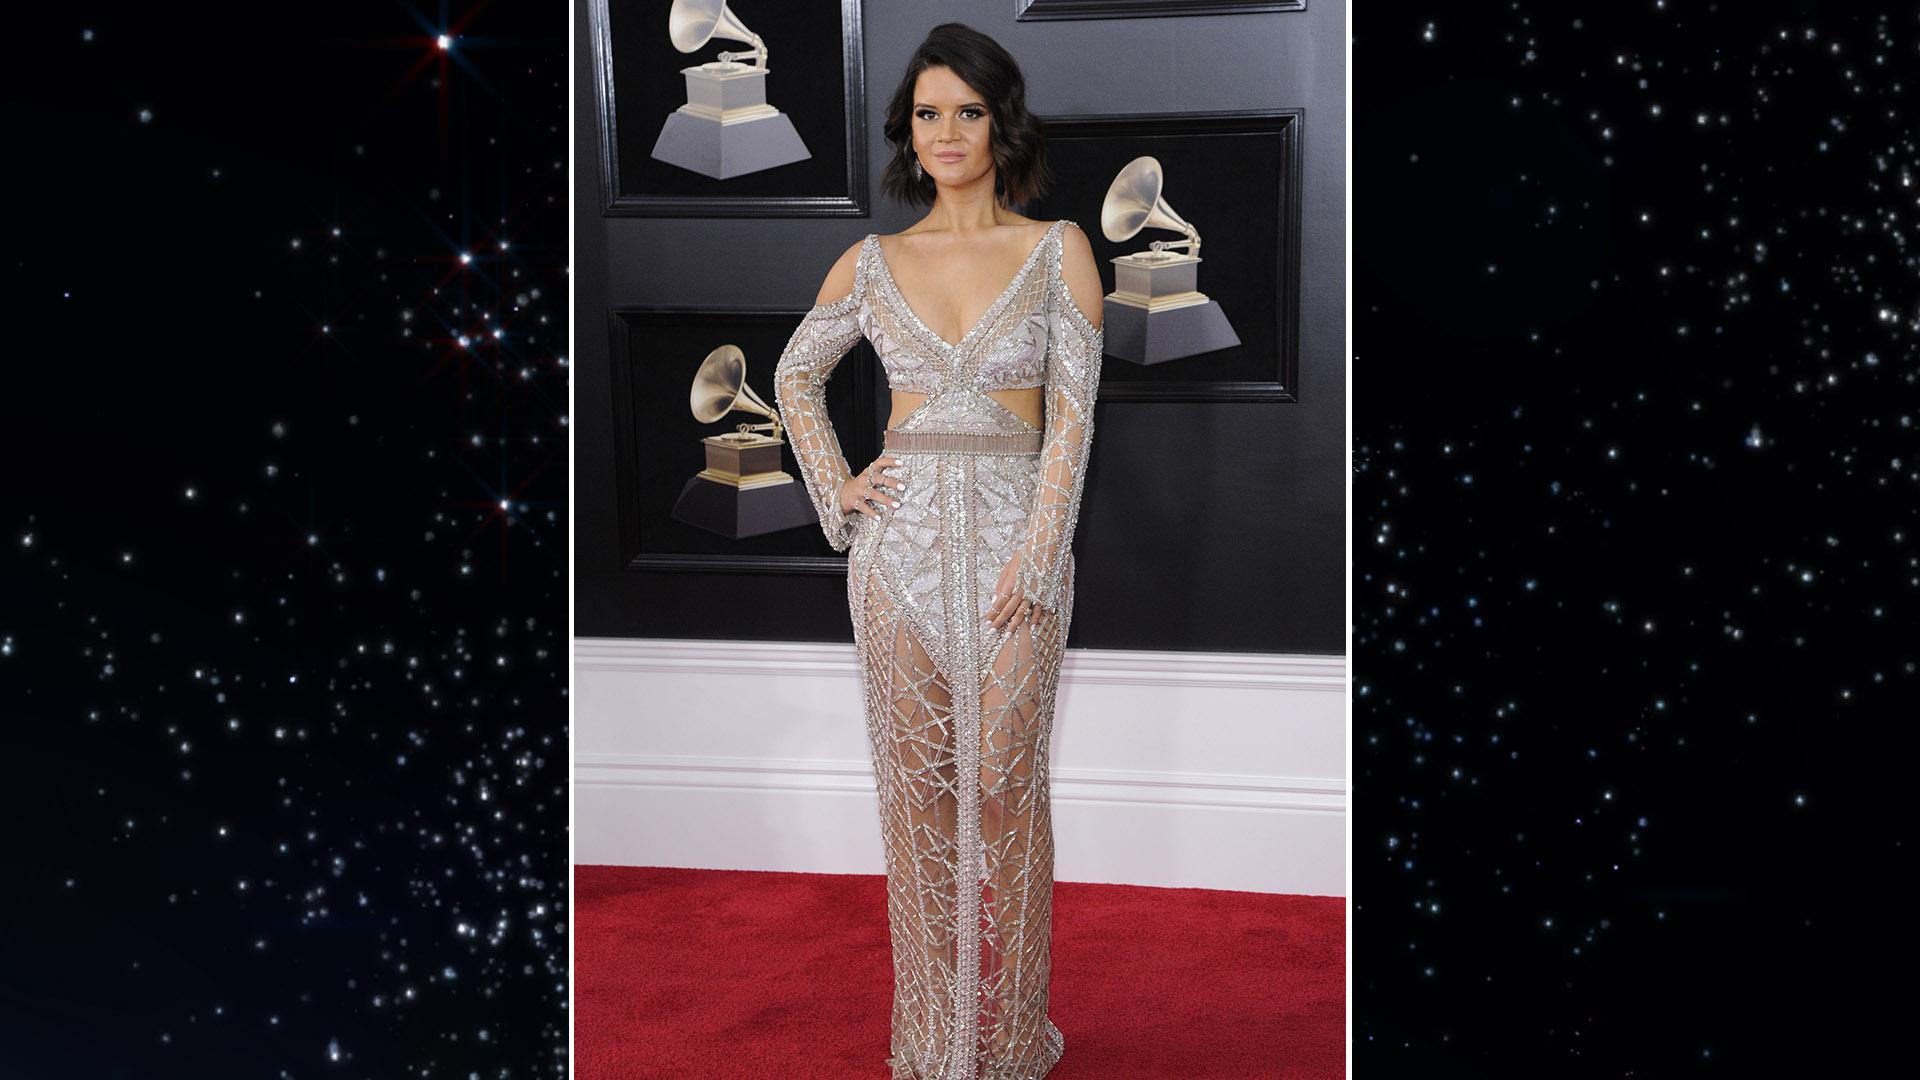 Maren Morris rocks a sparkly Julien Macdonald dress with shoulder cut-outs.